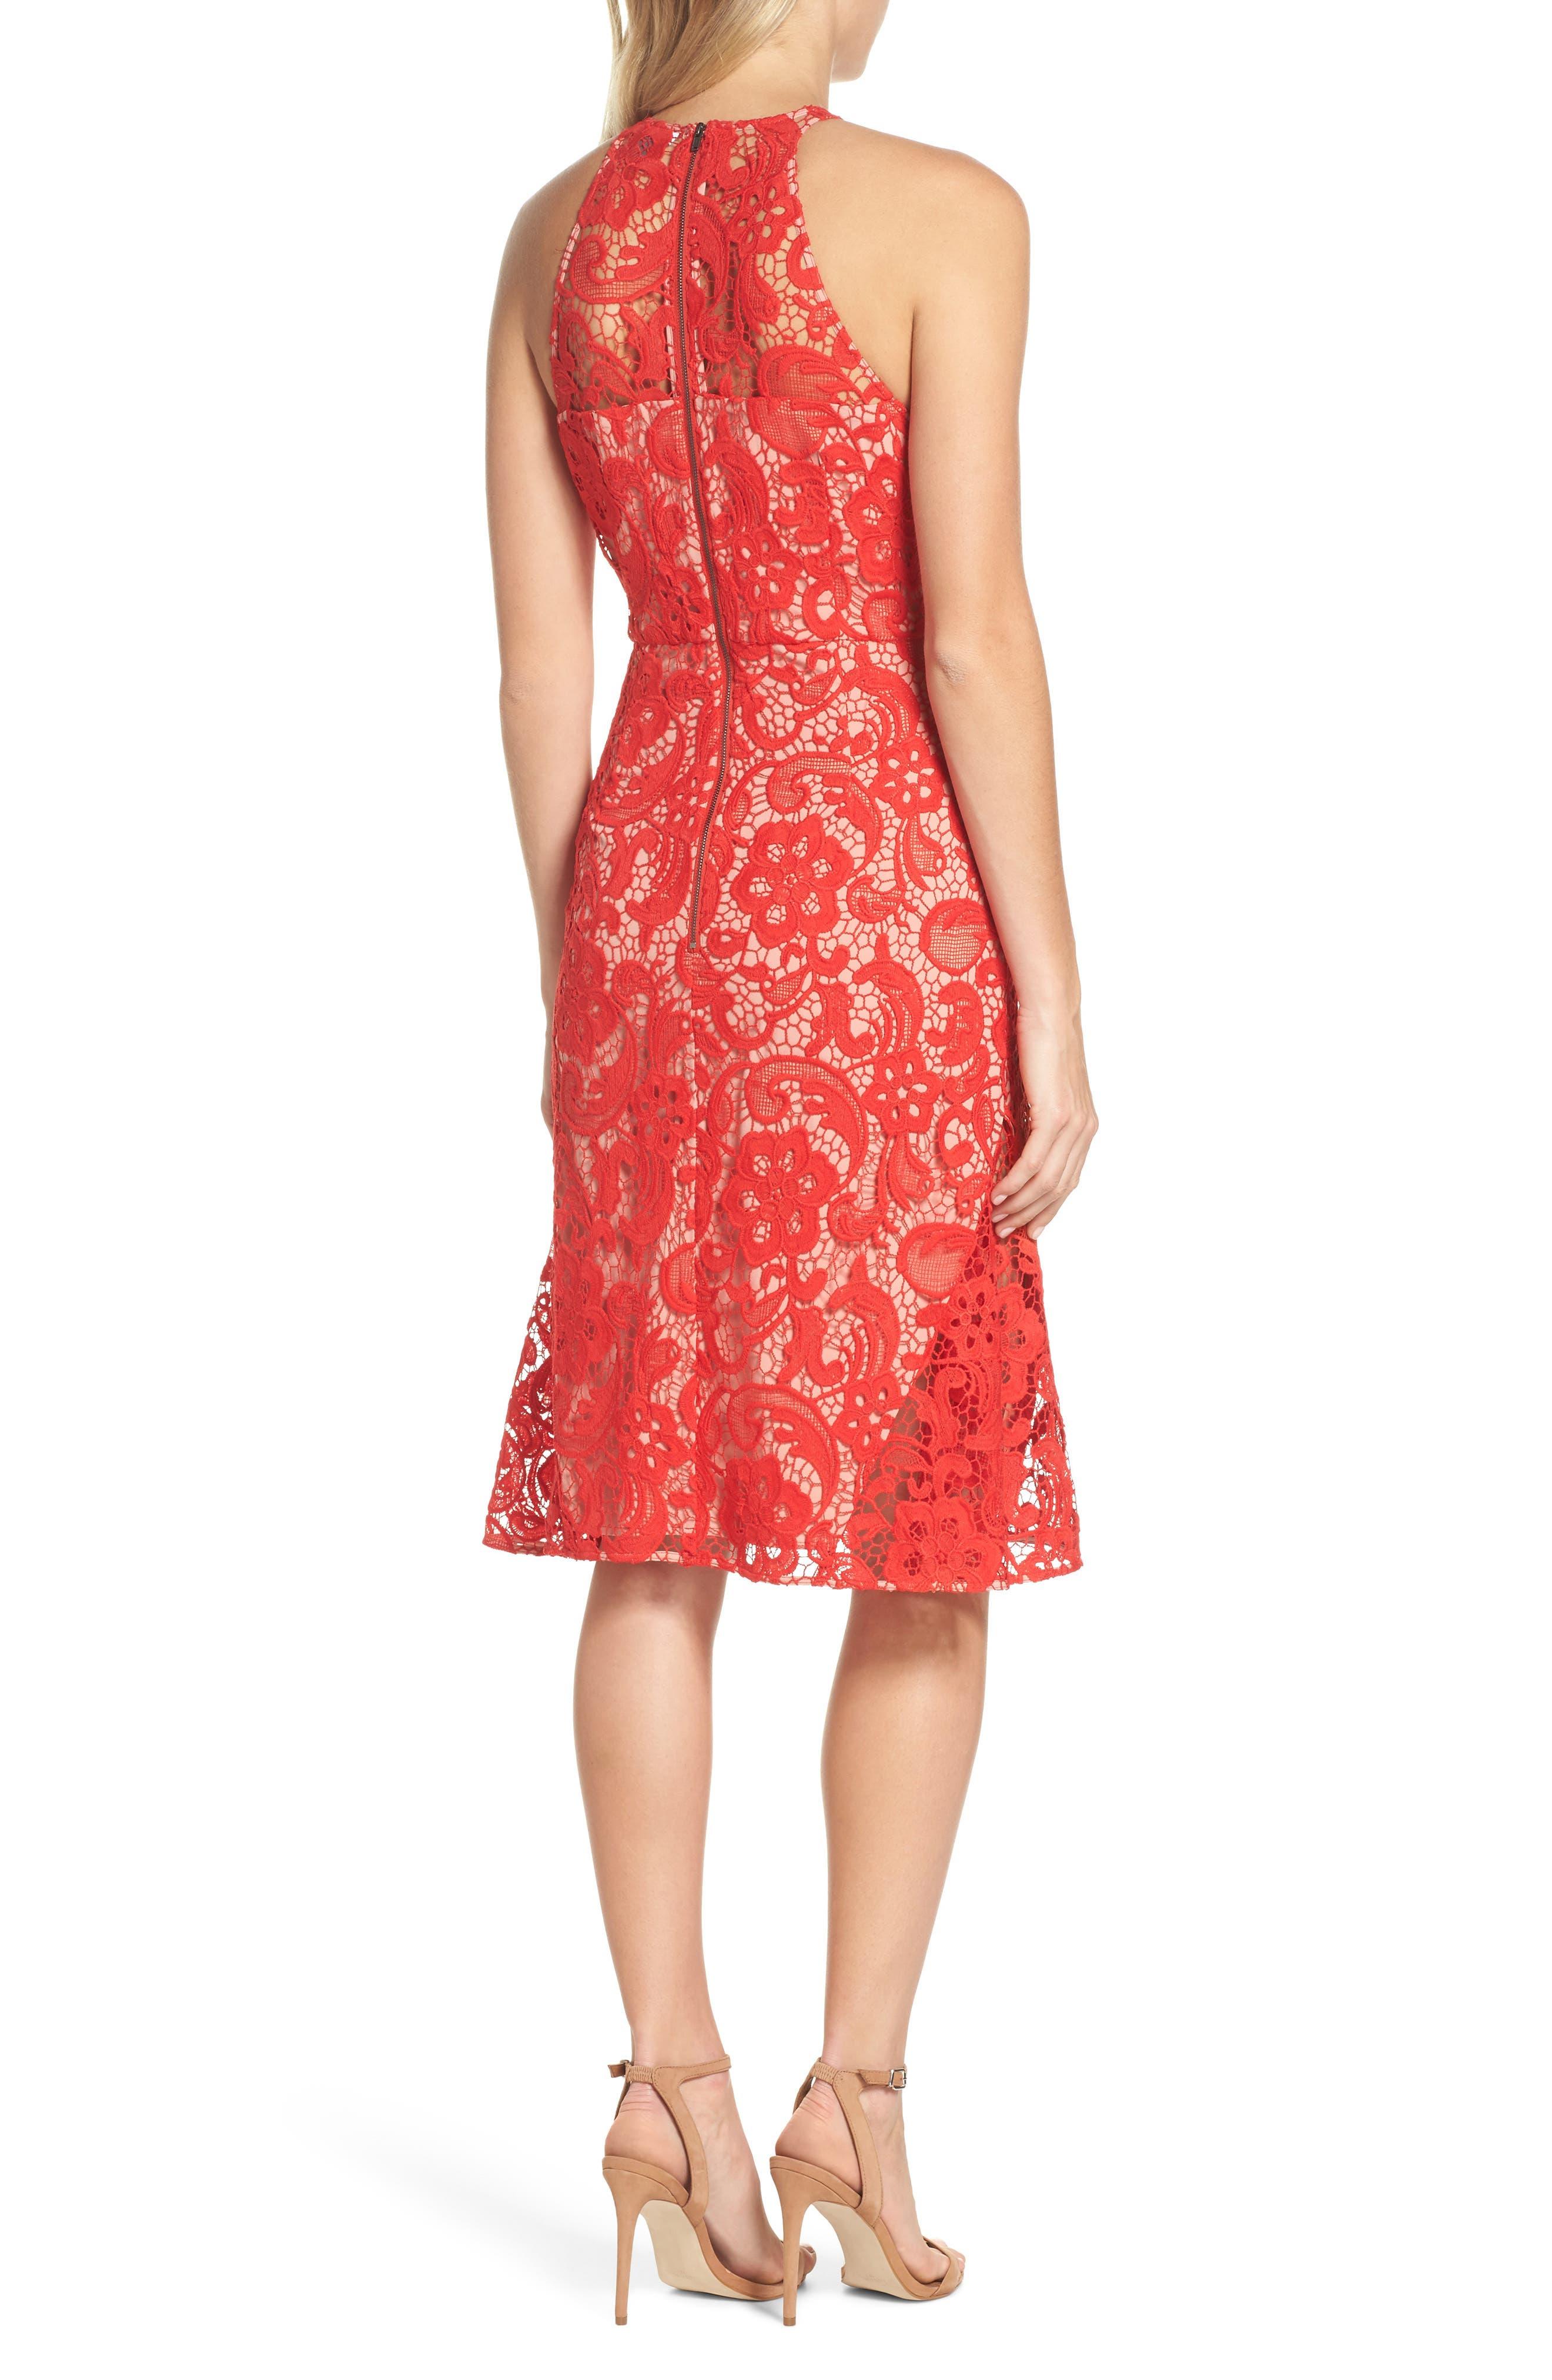 Carnation Lace Dress,                             Alternate thumbnail 2, color,                             600